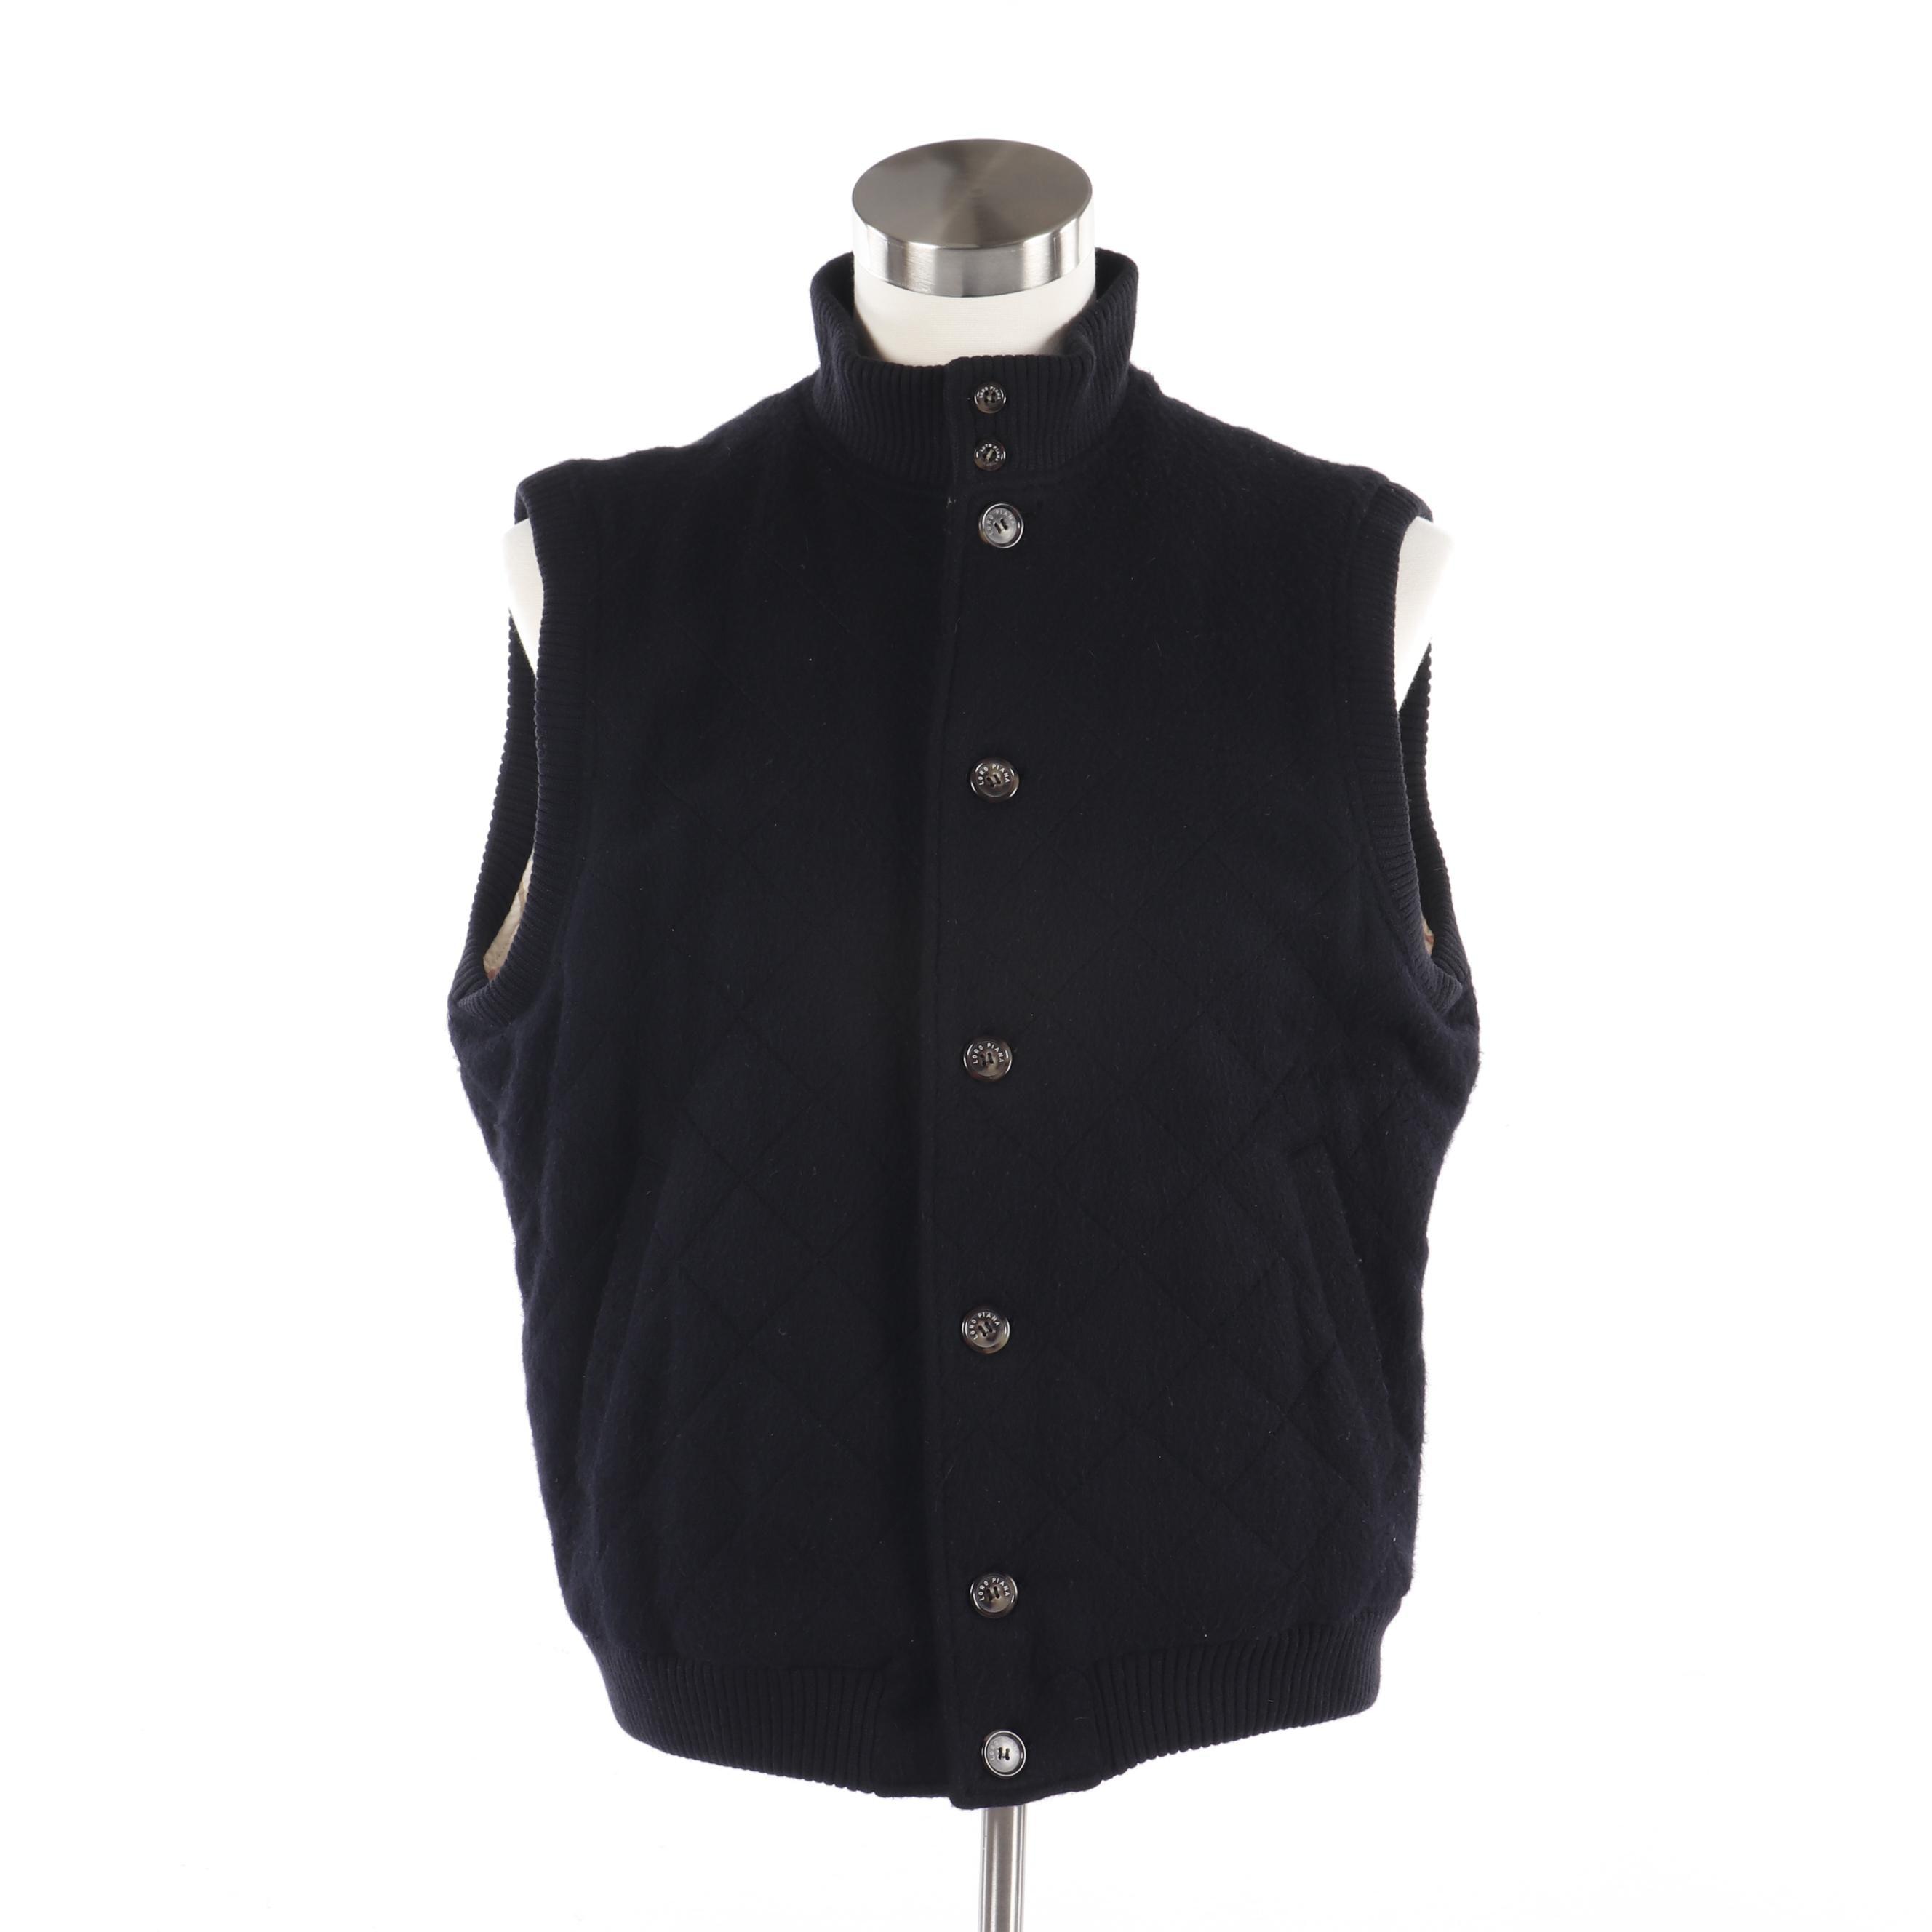 Women's Loro Piana Cashmere Vest, Made in Italy